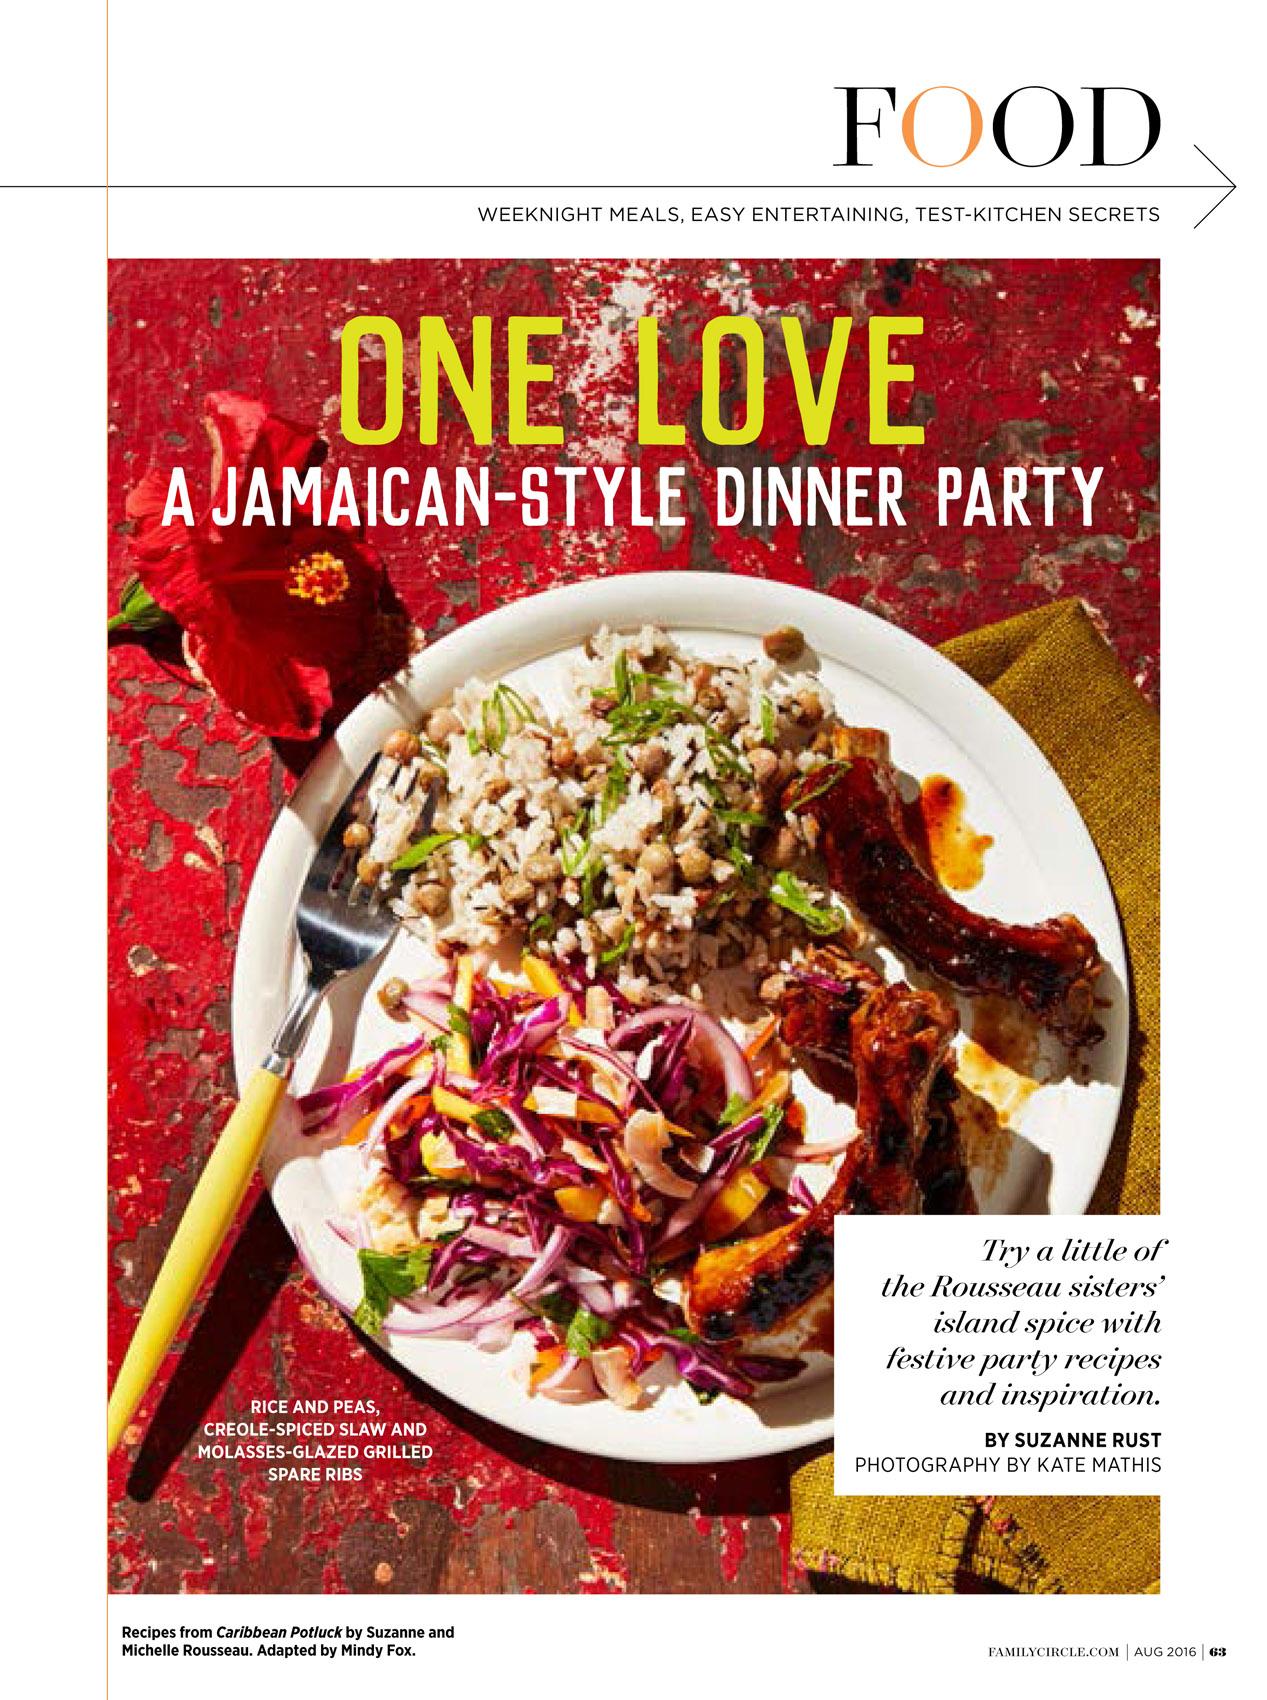 FamilyCircle_JamaicanParty-1_web.jpg